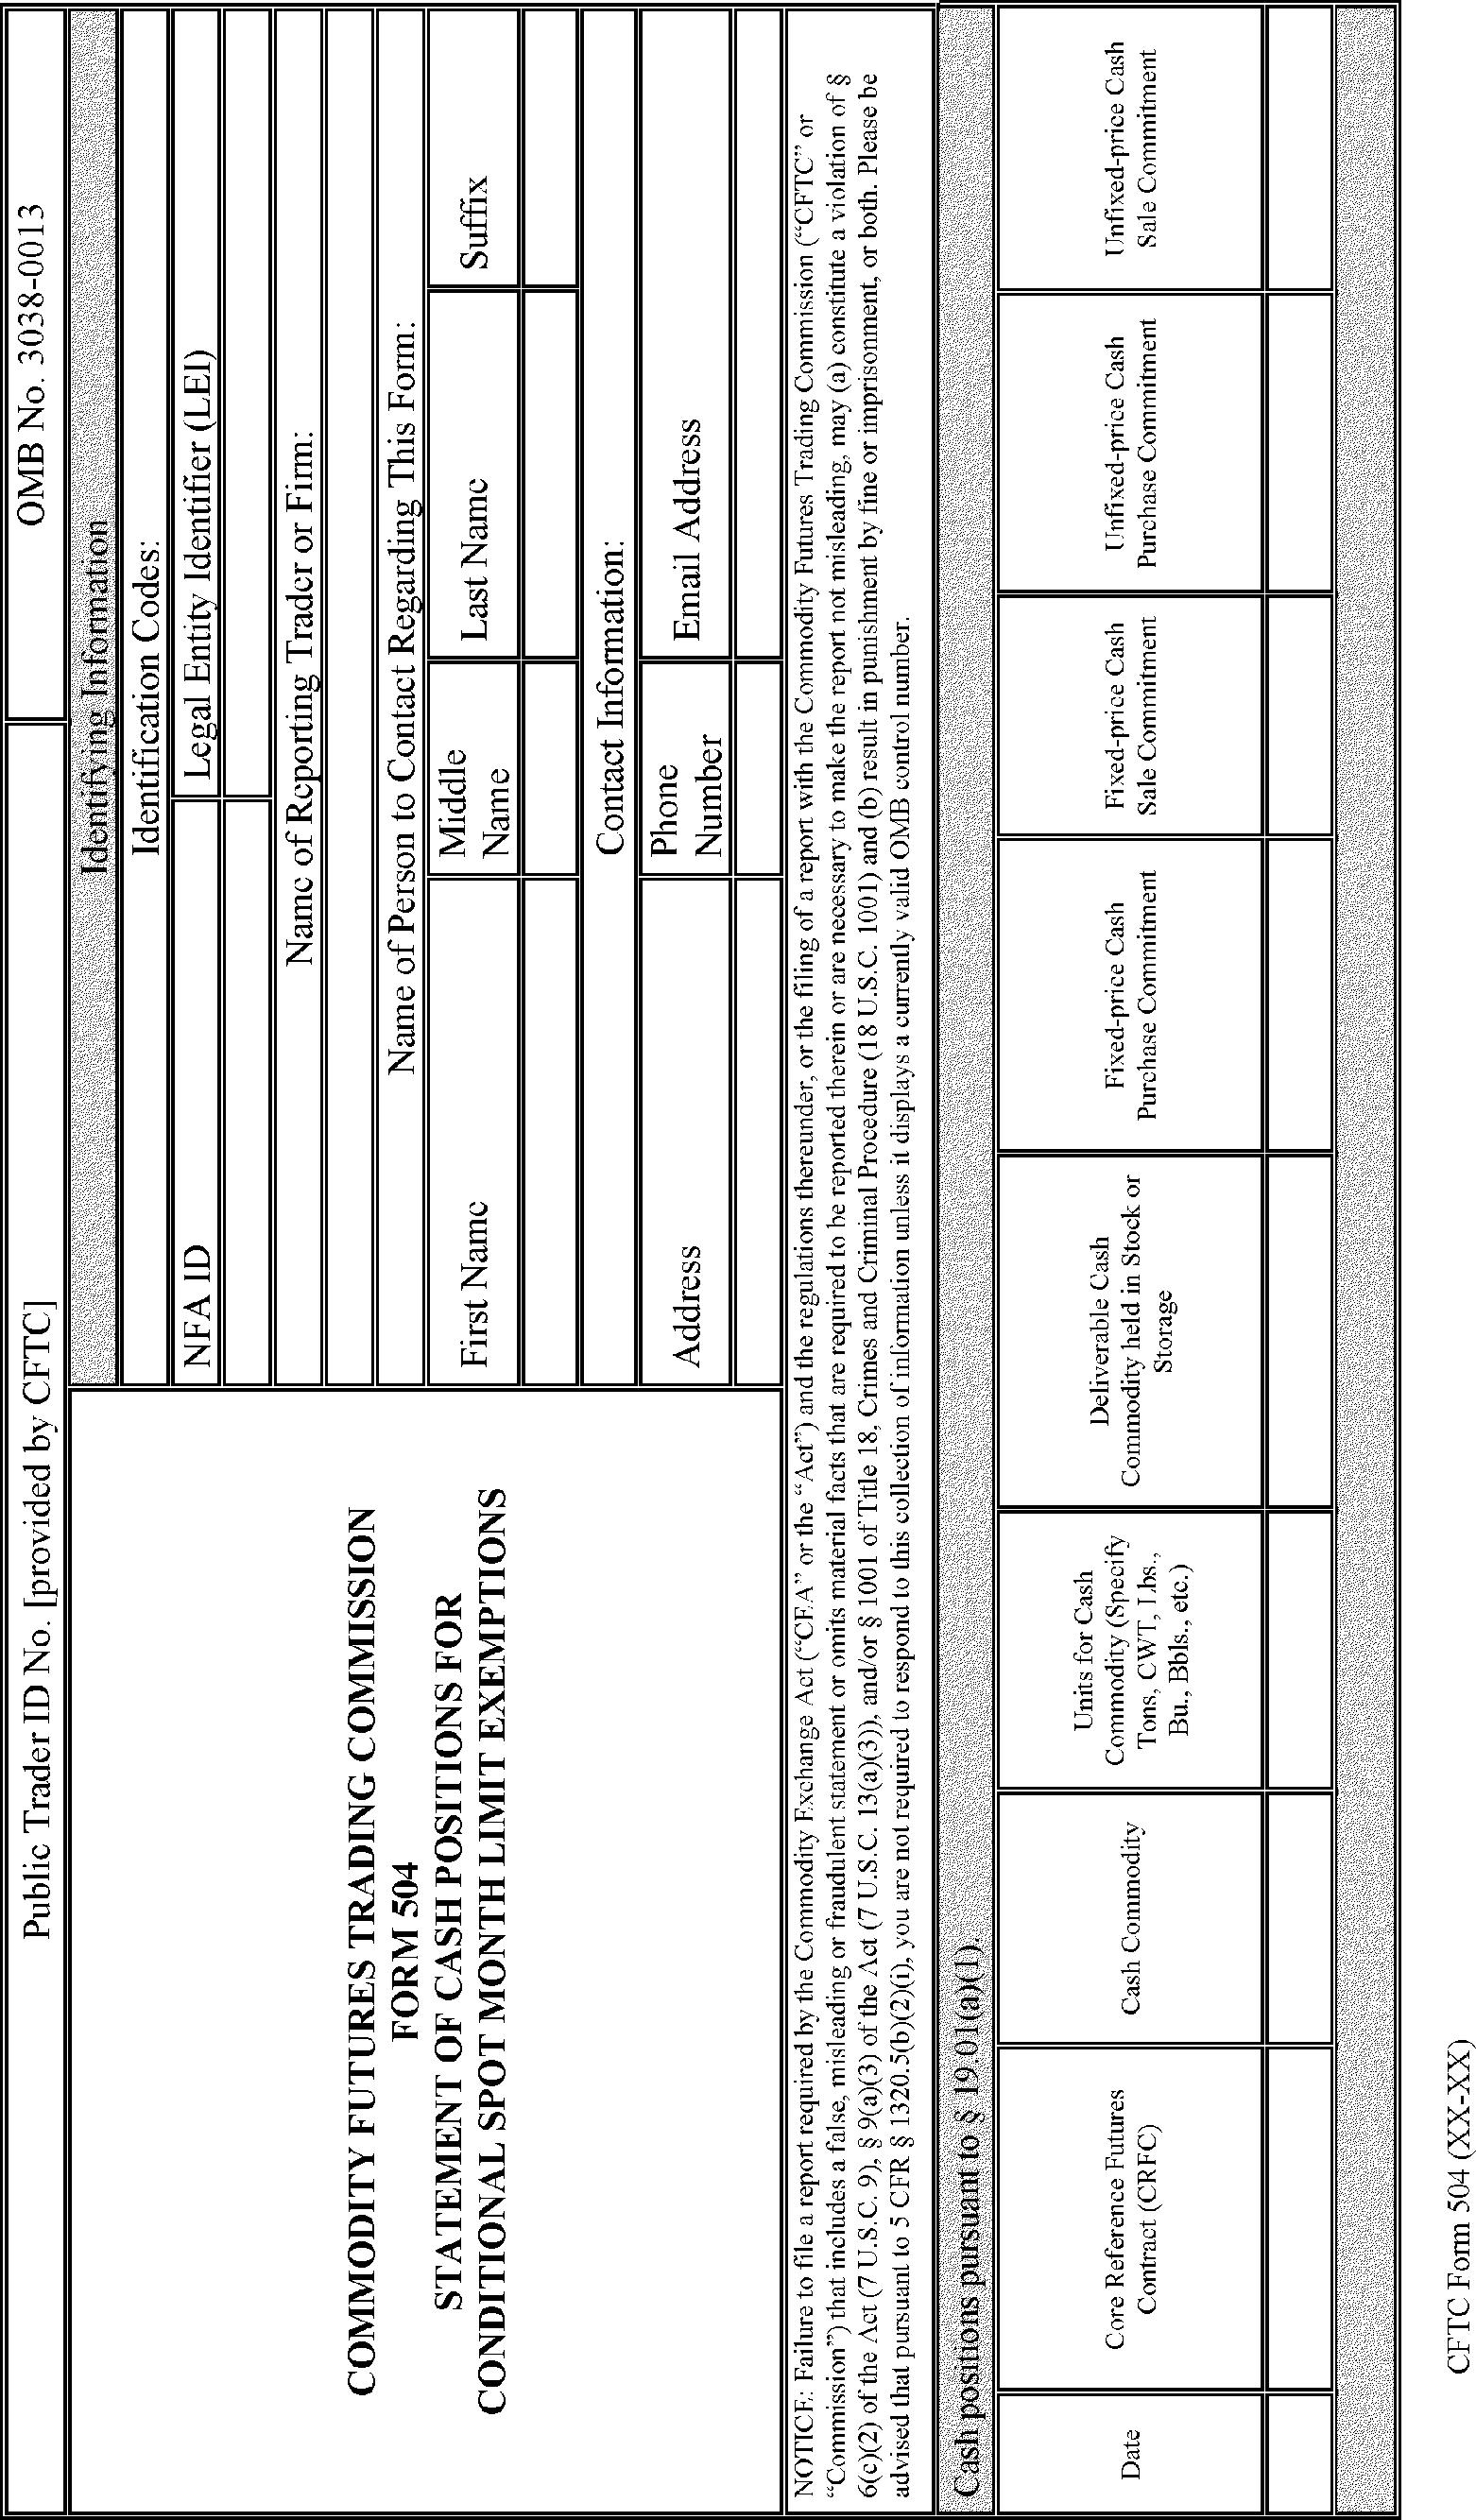 Federal Register :: Position Limits for Derivatives on entertainment order form, money order form, product order form, manufacturing order form, customer order form, produce order form, commodities order form, furniture order form, coffee order form, payment order form, corporate order form, engineering order form, invoice order form, production order form, equipment order form, asset order form, mediation order form, event order form, retail order form, trade order form,